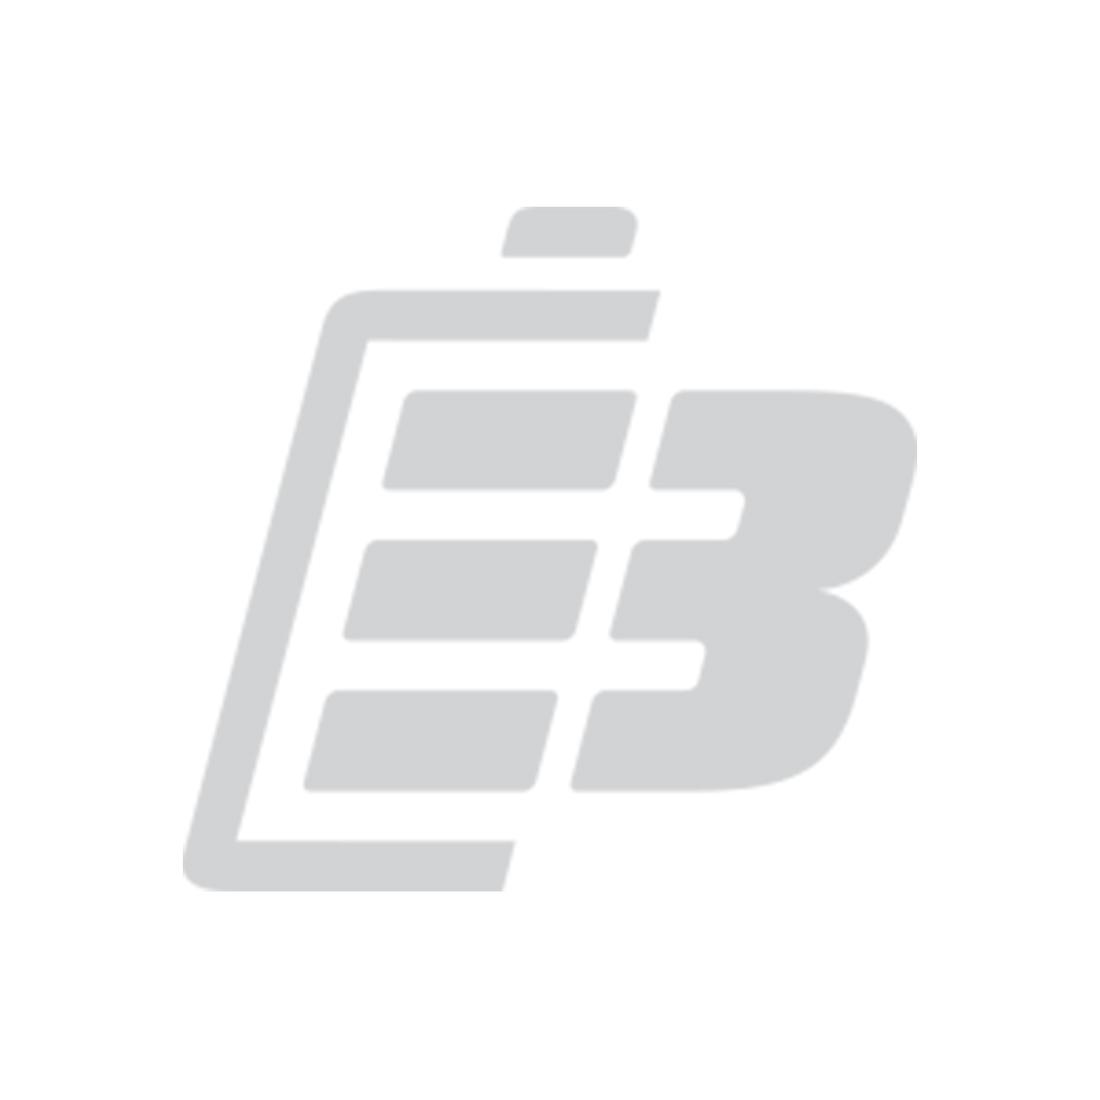 Micro USB to Type C Adapter